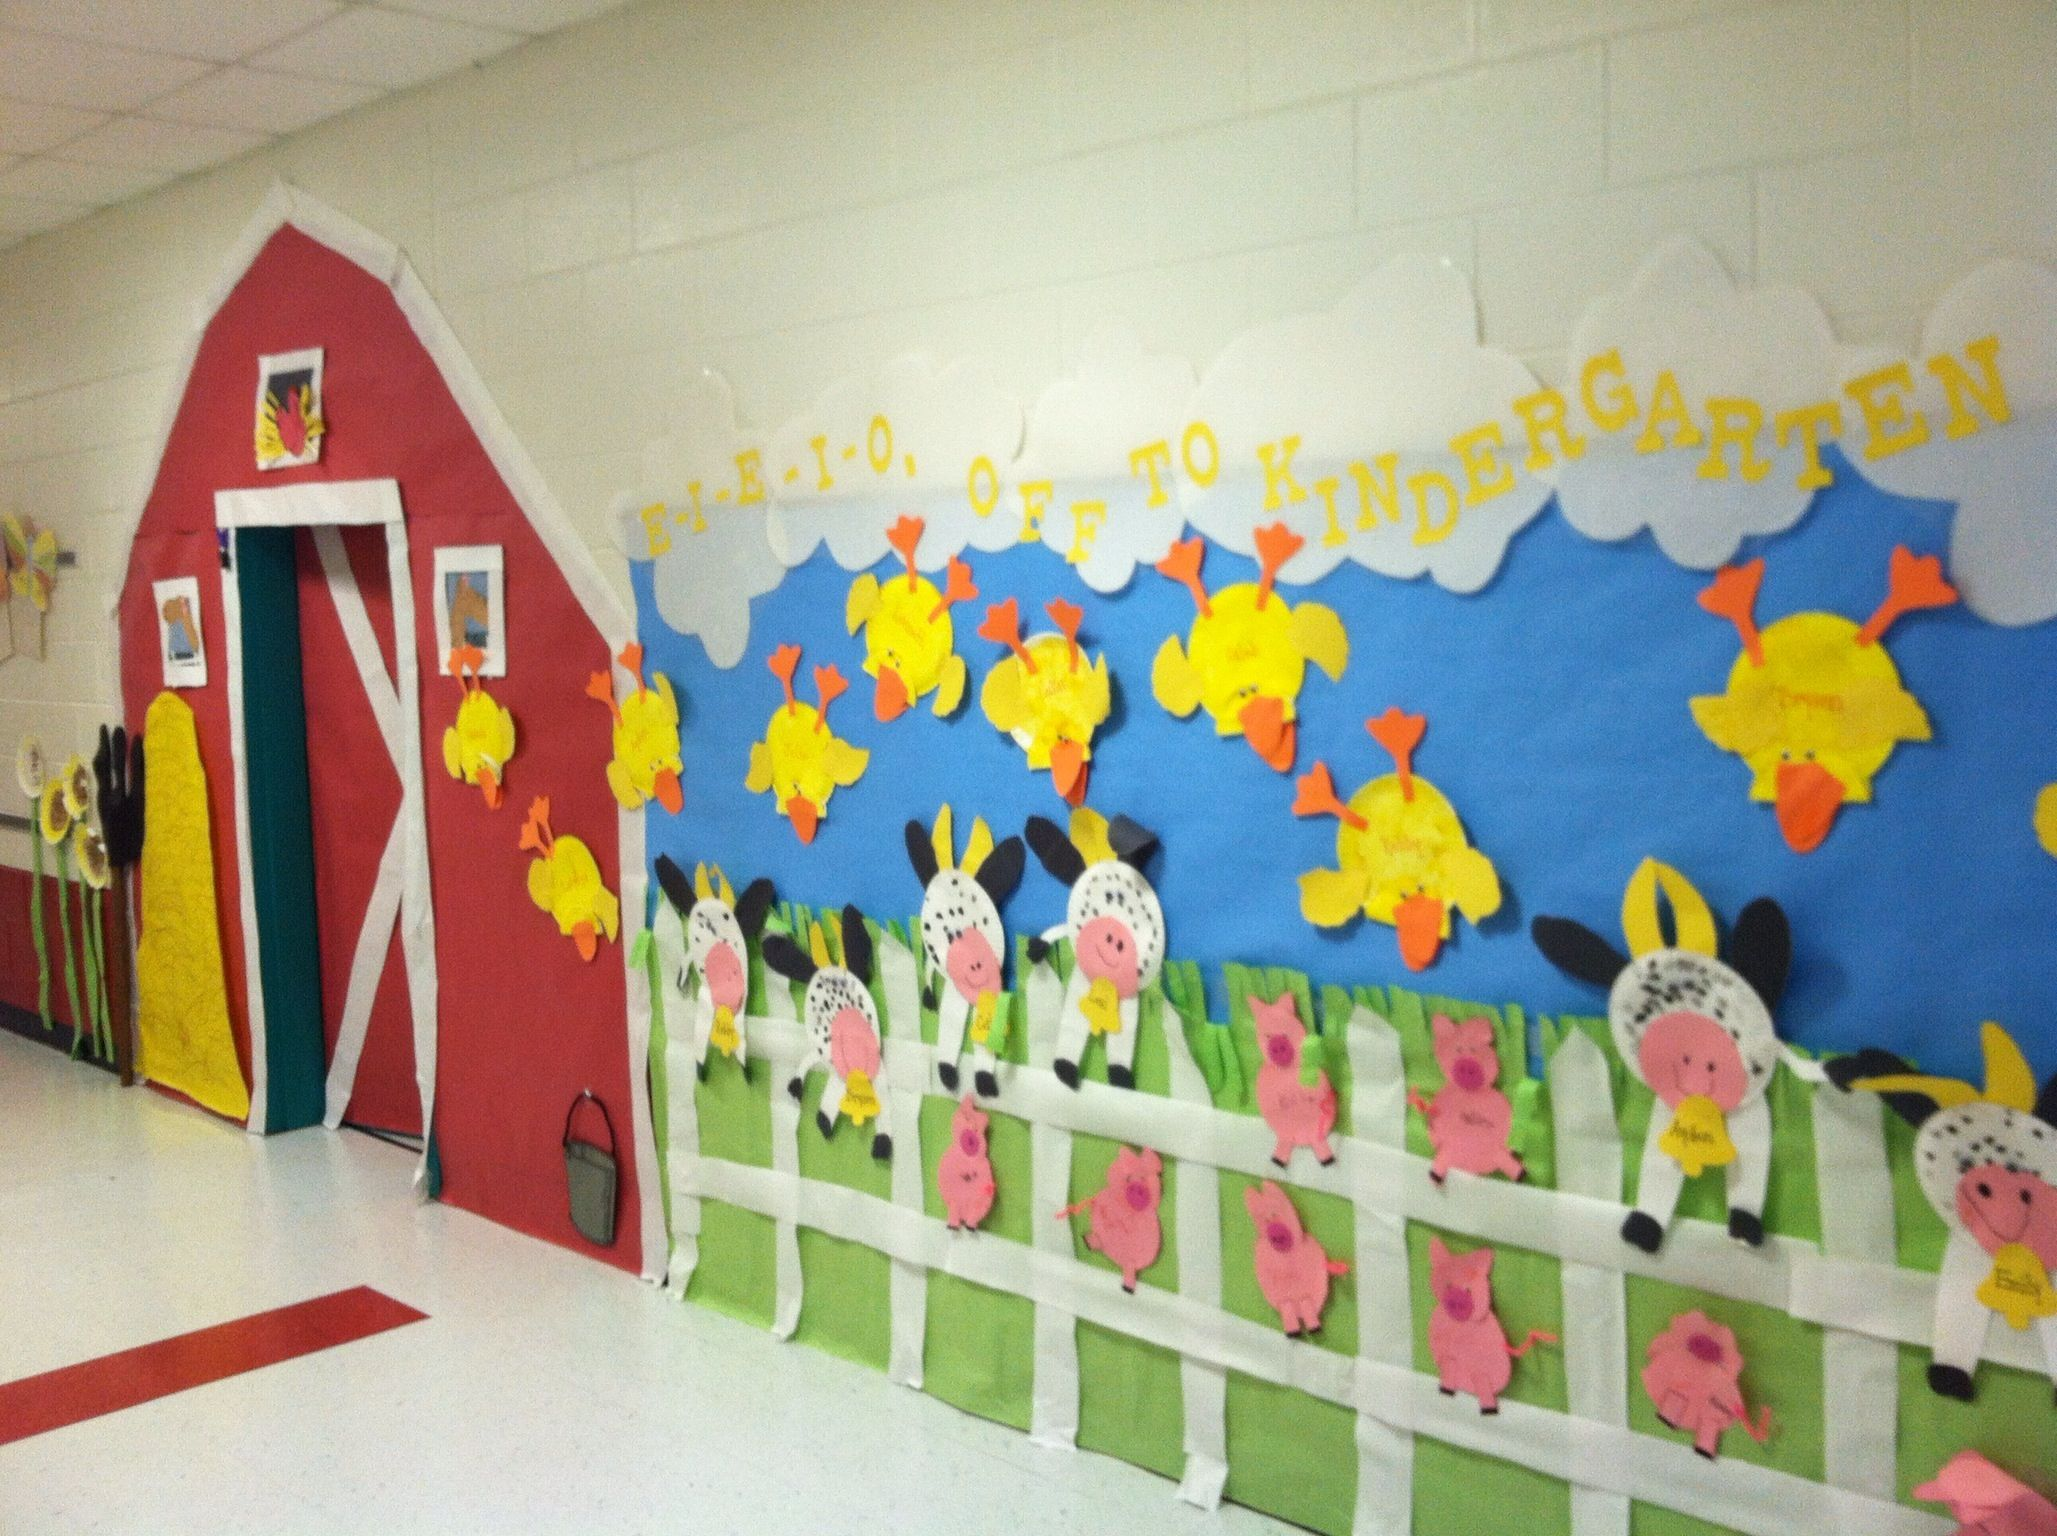 Art craft ideas and bulletin boards for elementary schools vegetable - Farm Animal Bulletin Board Idea For Kids